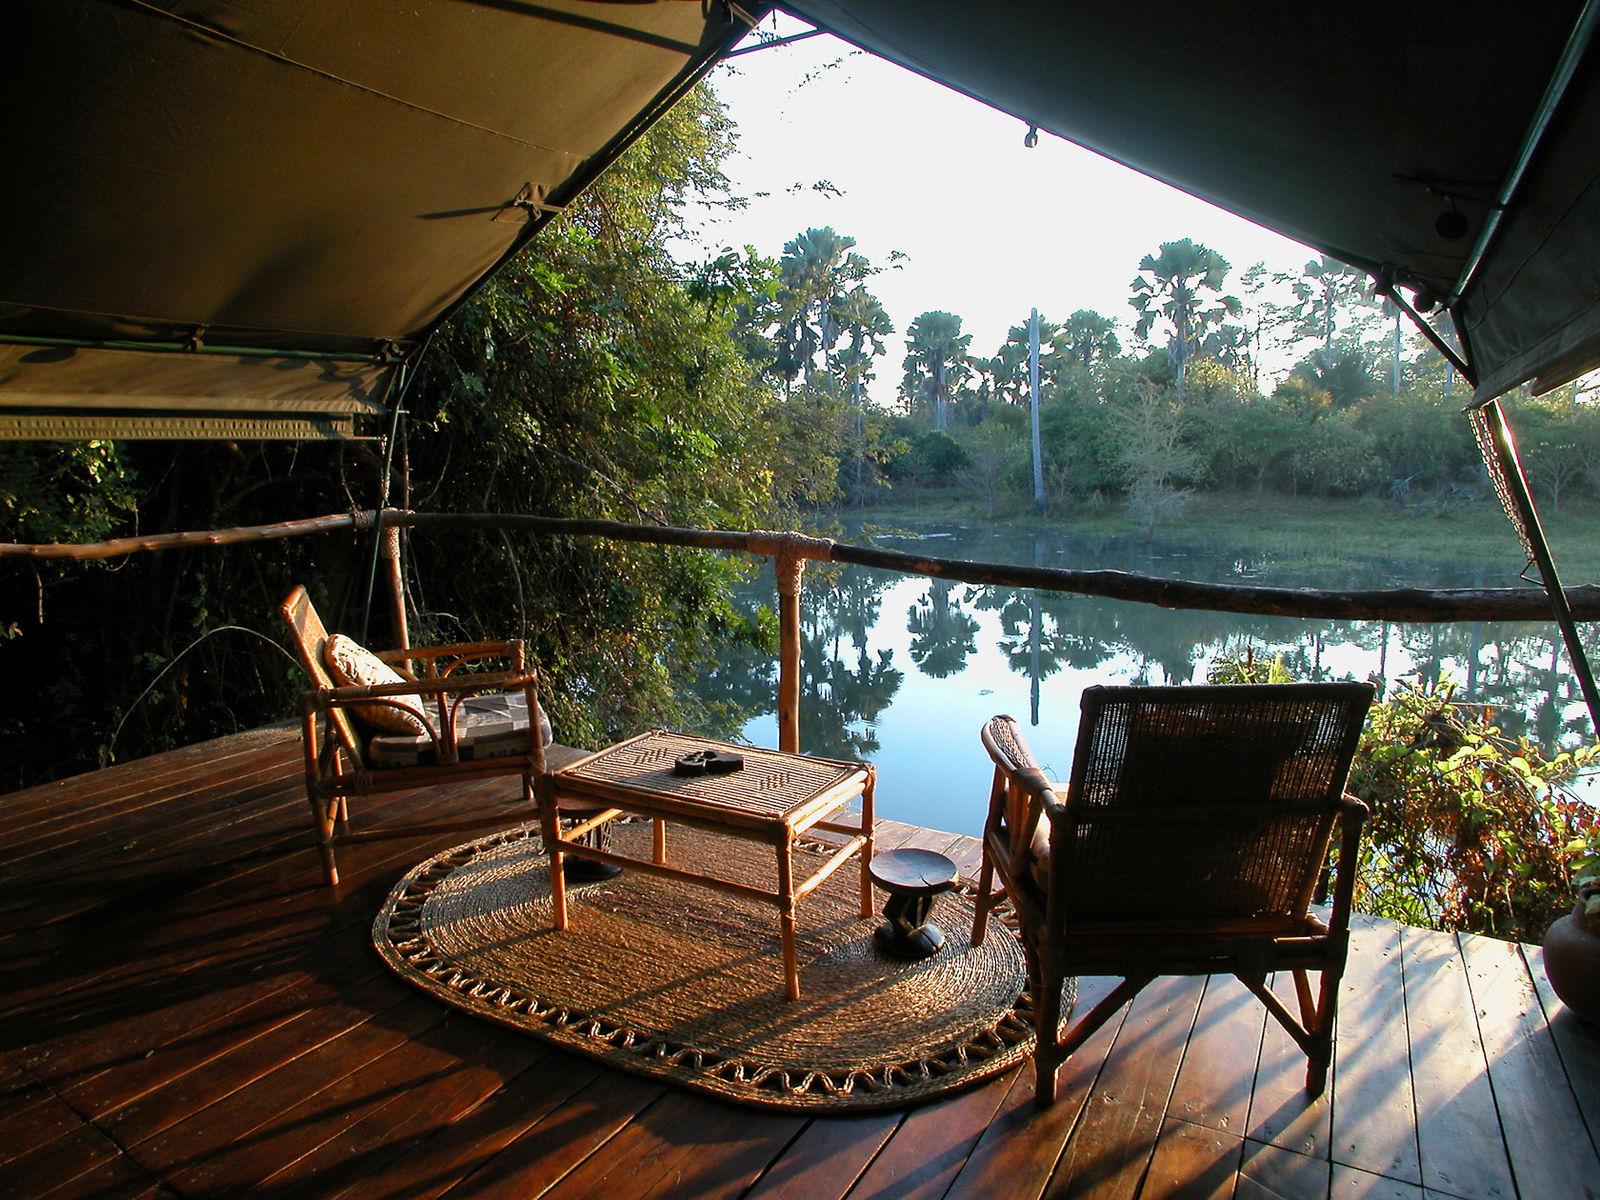 Rondreis Malawi hoogtepunten - AmbianceTravel